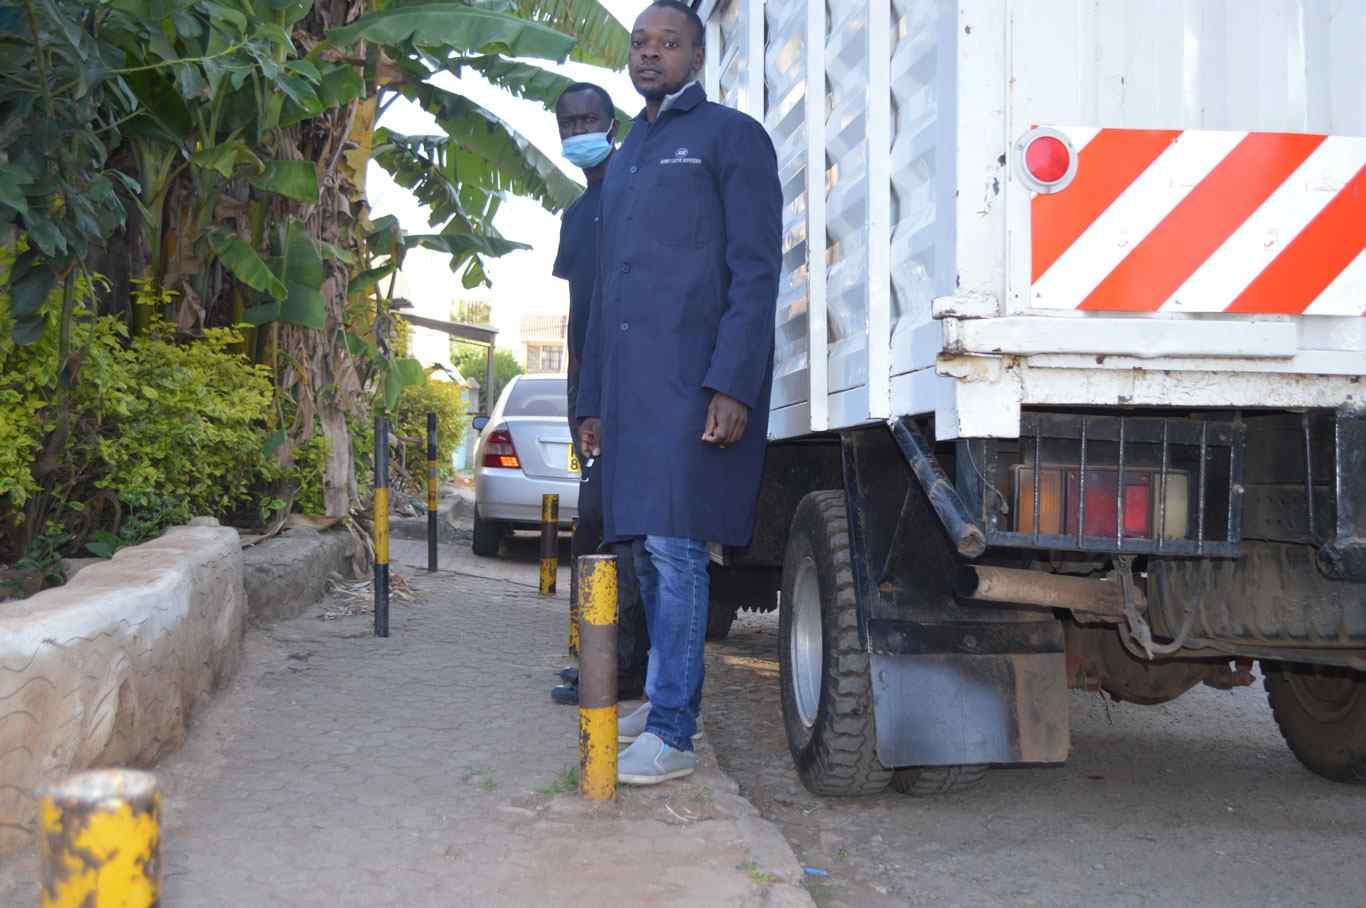 moving company in Kenya